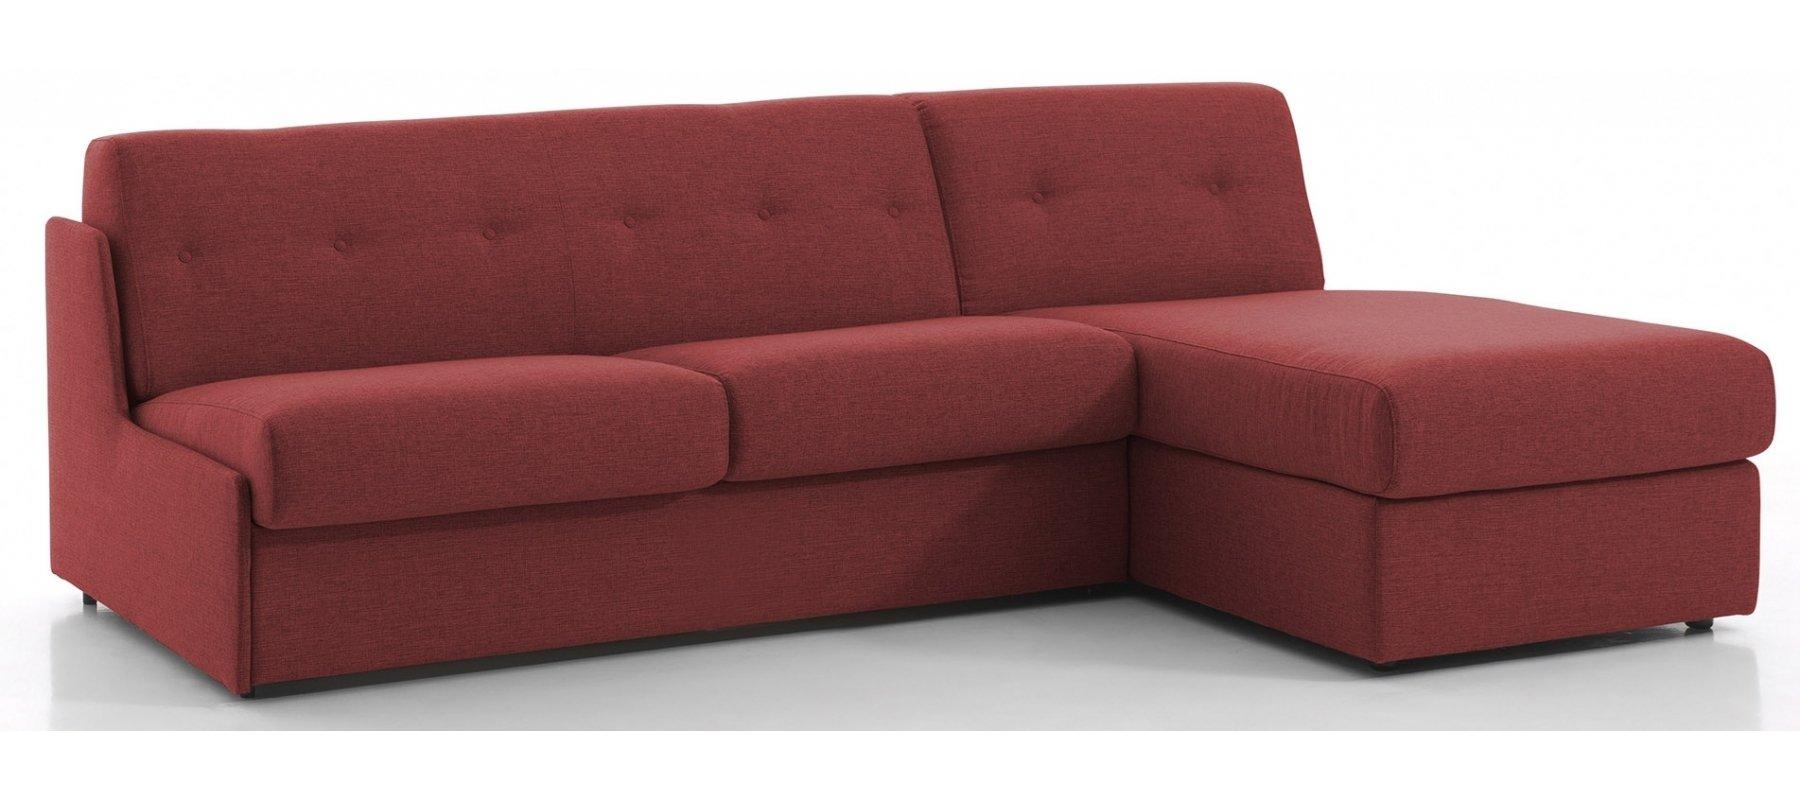 canap d 39 angle convertible 5 places rapido matelas. Black Bedroom Furniture Sets. Home Design Ideas